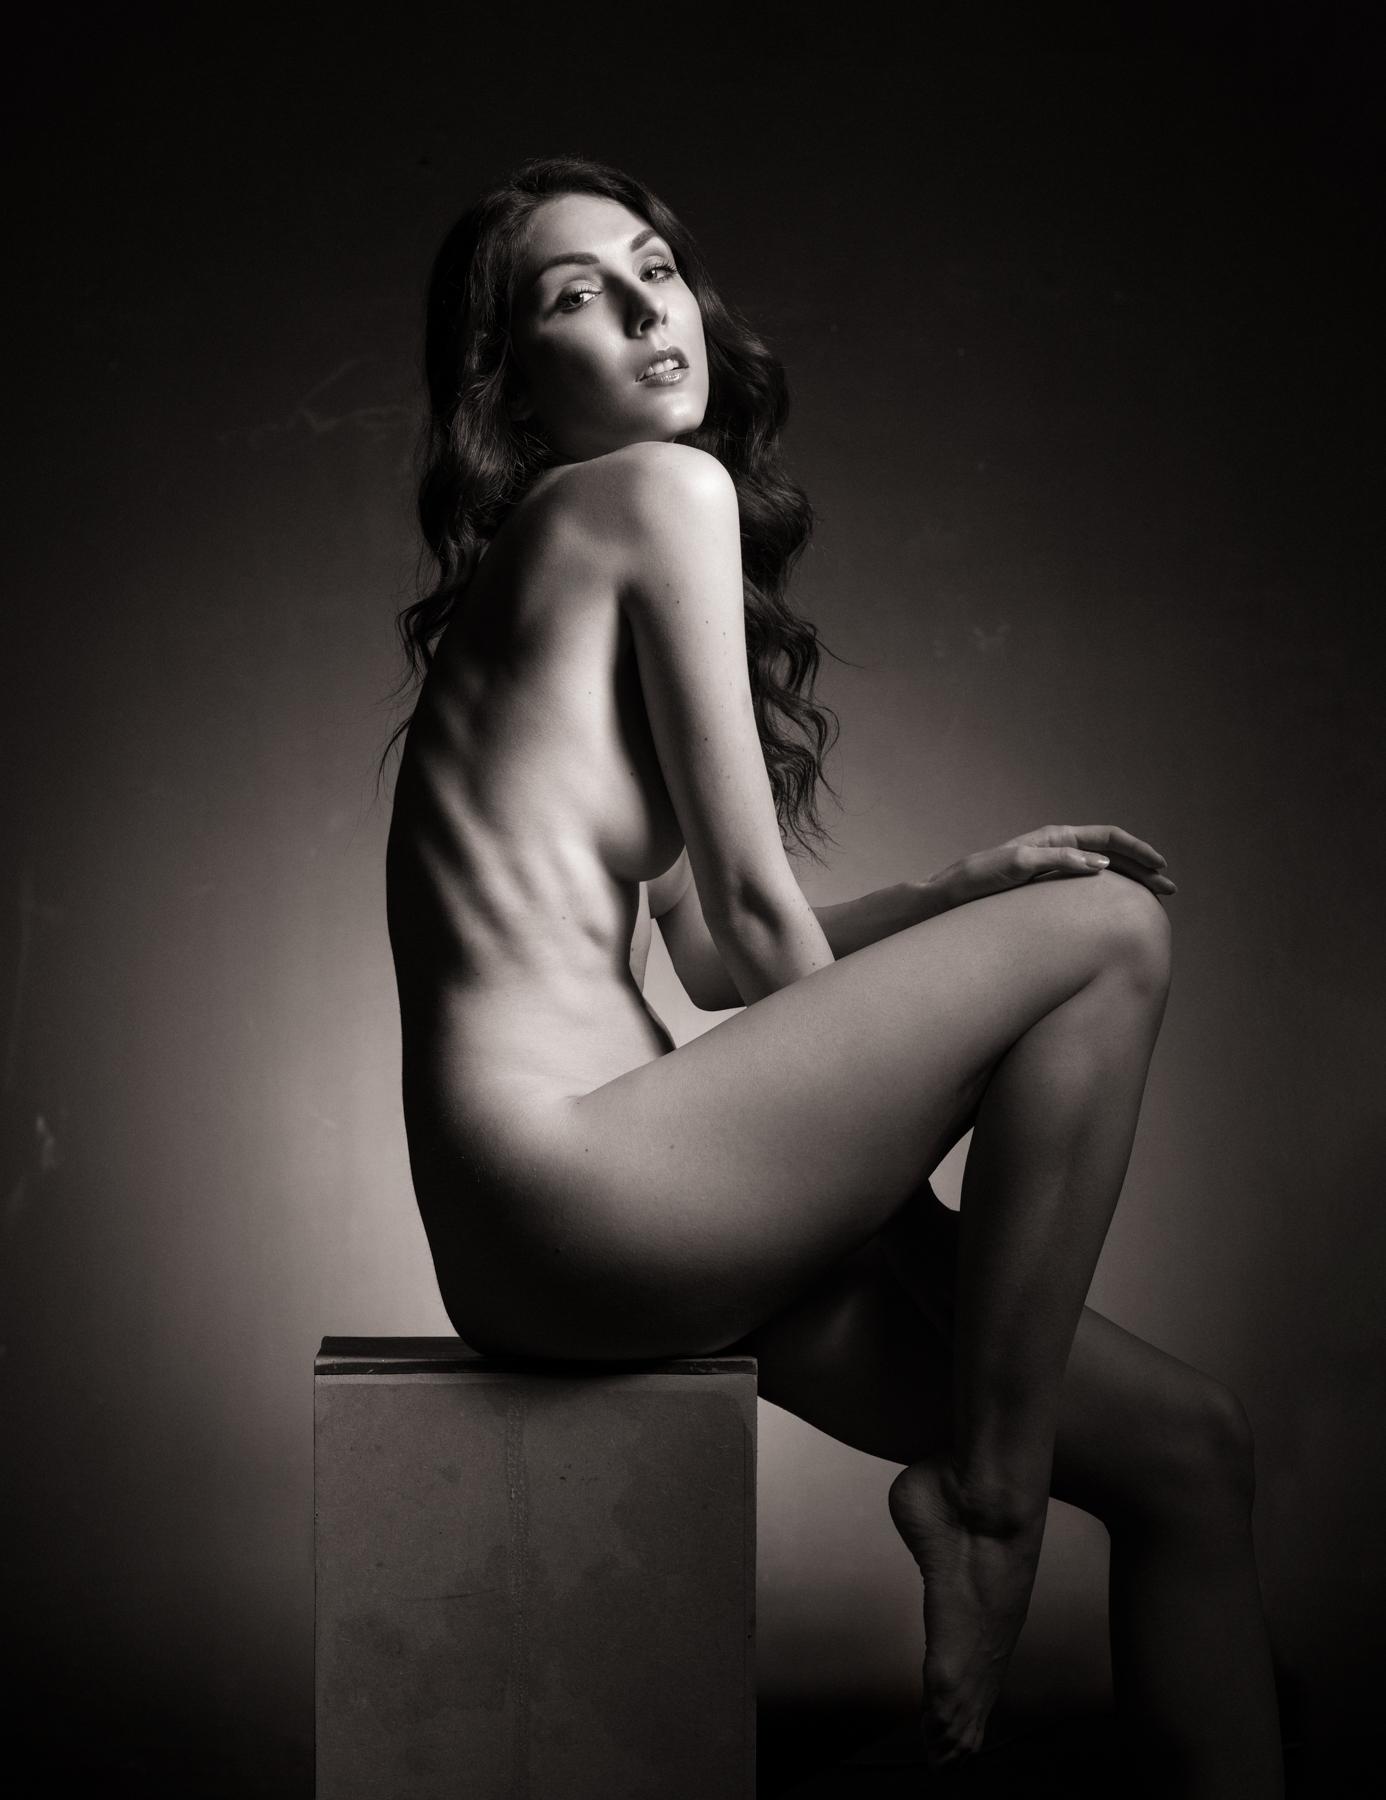 Photo by Alexandre Cabrita